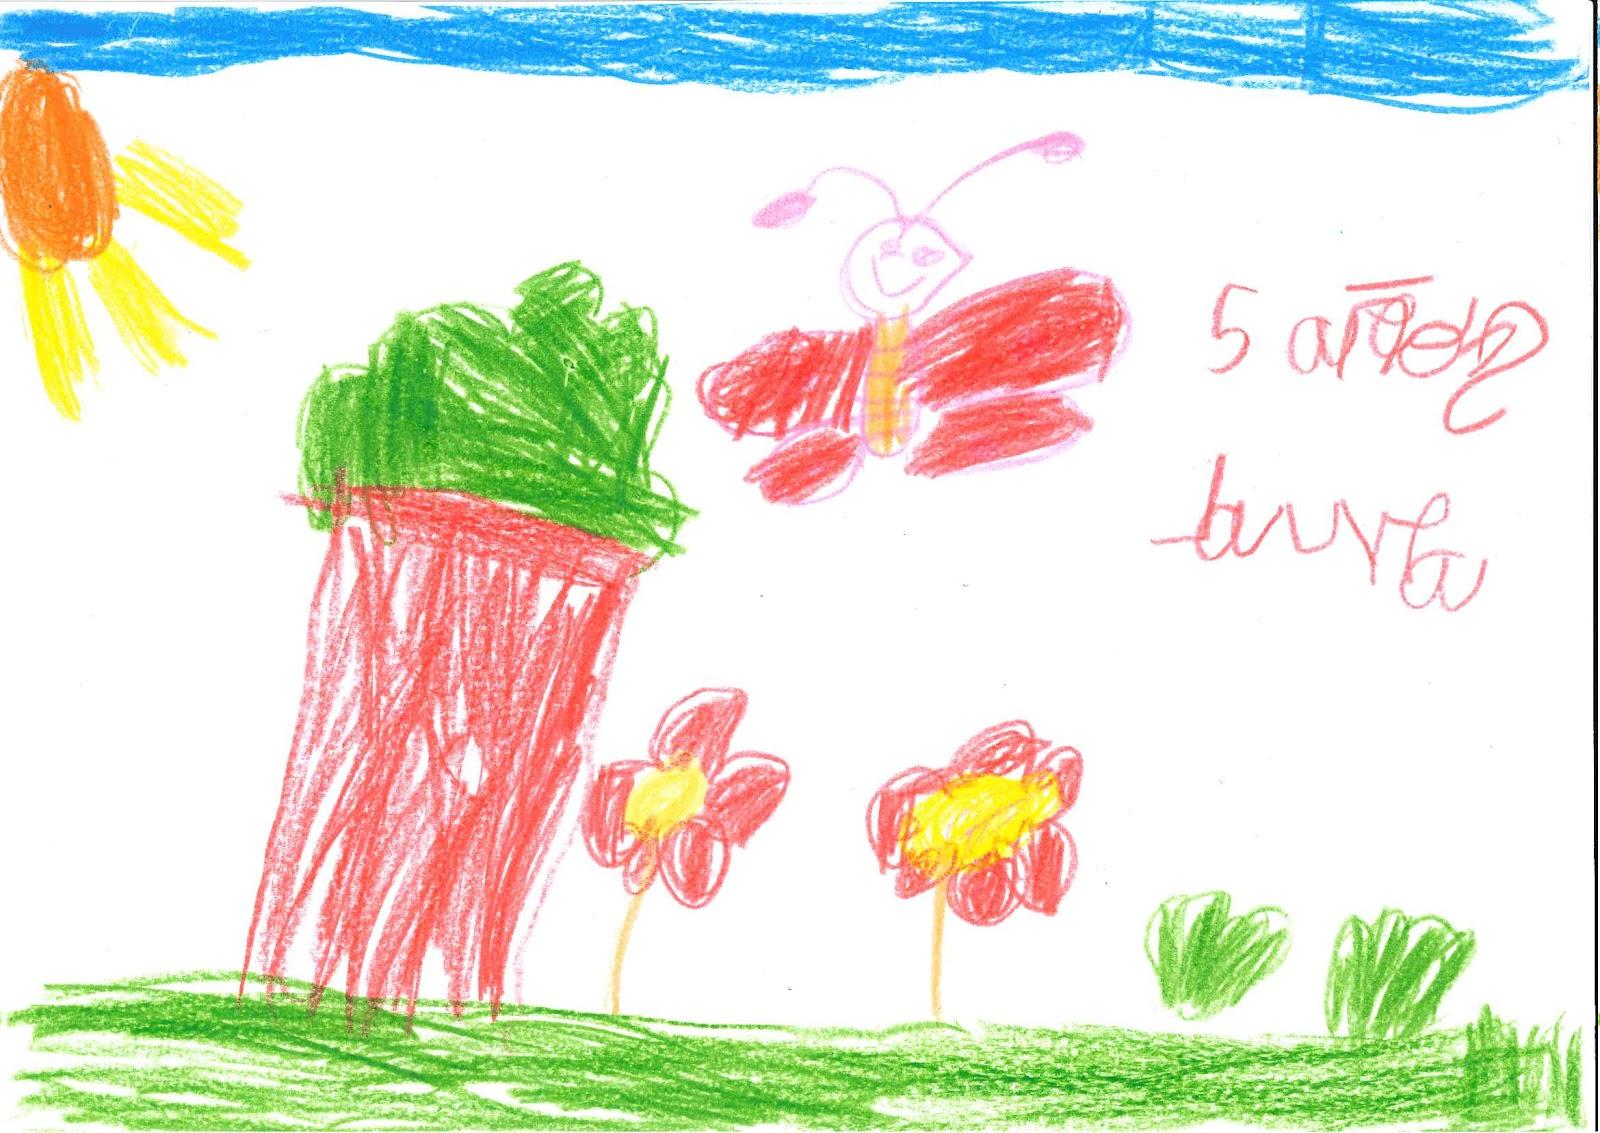 Comedor escolar san sebasti n concurso de dibujo for Comedor escolar dibujo